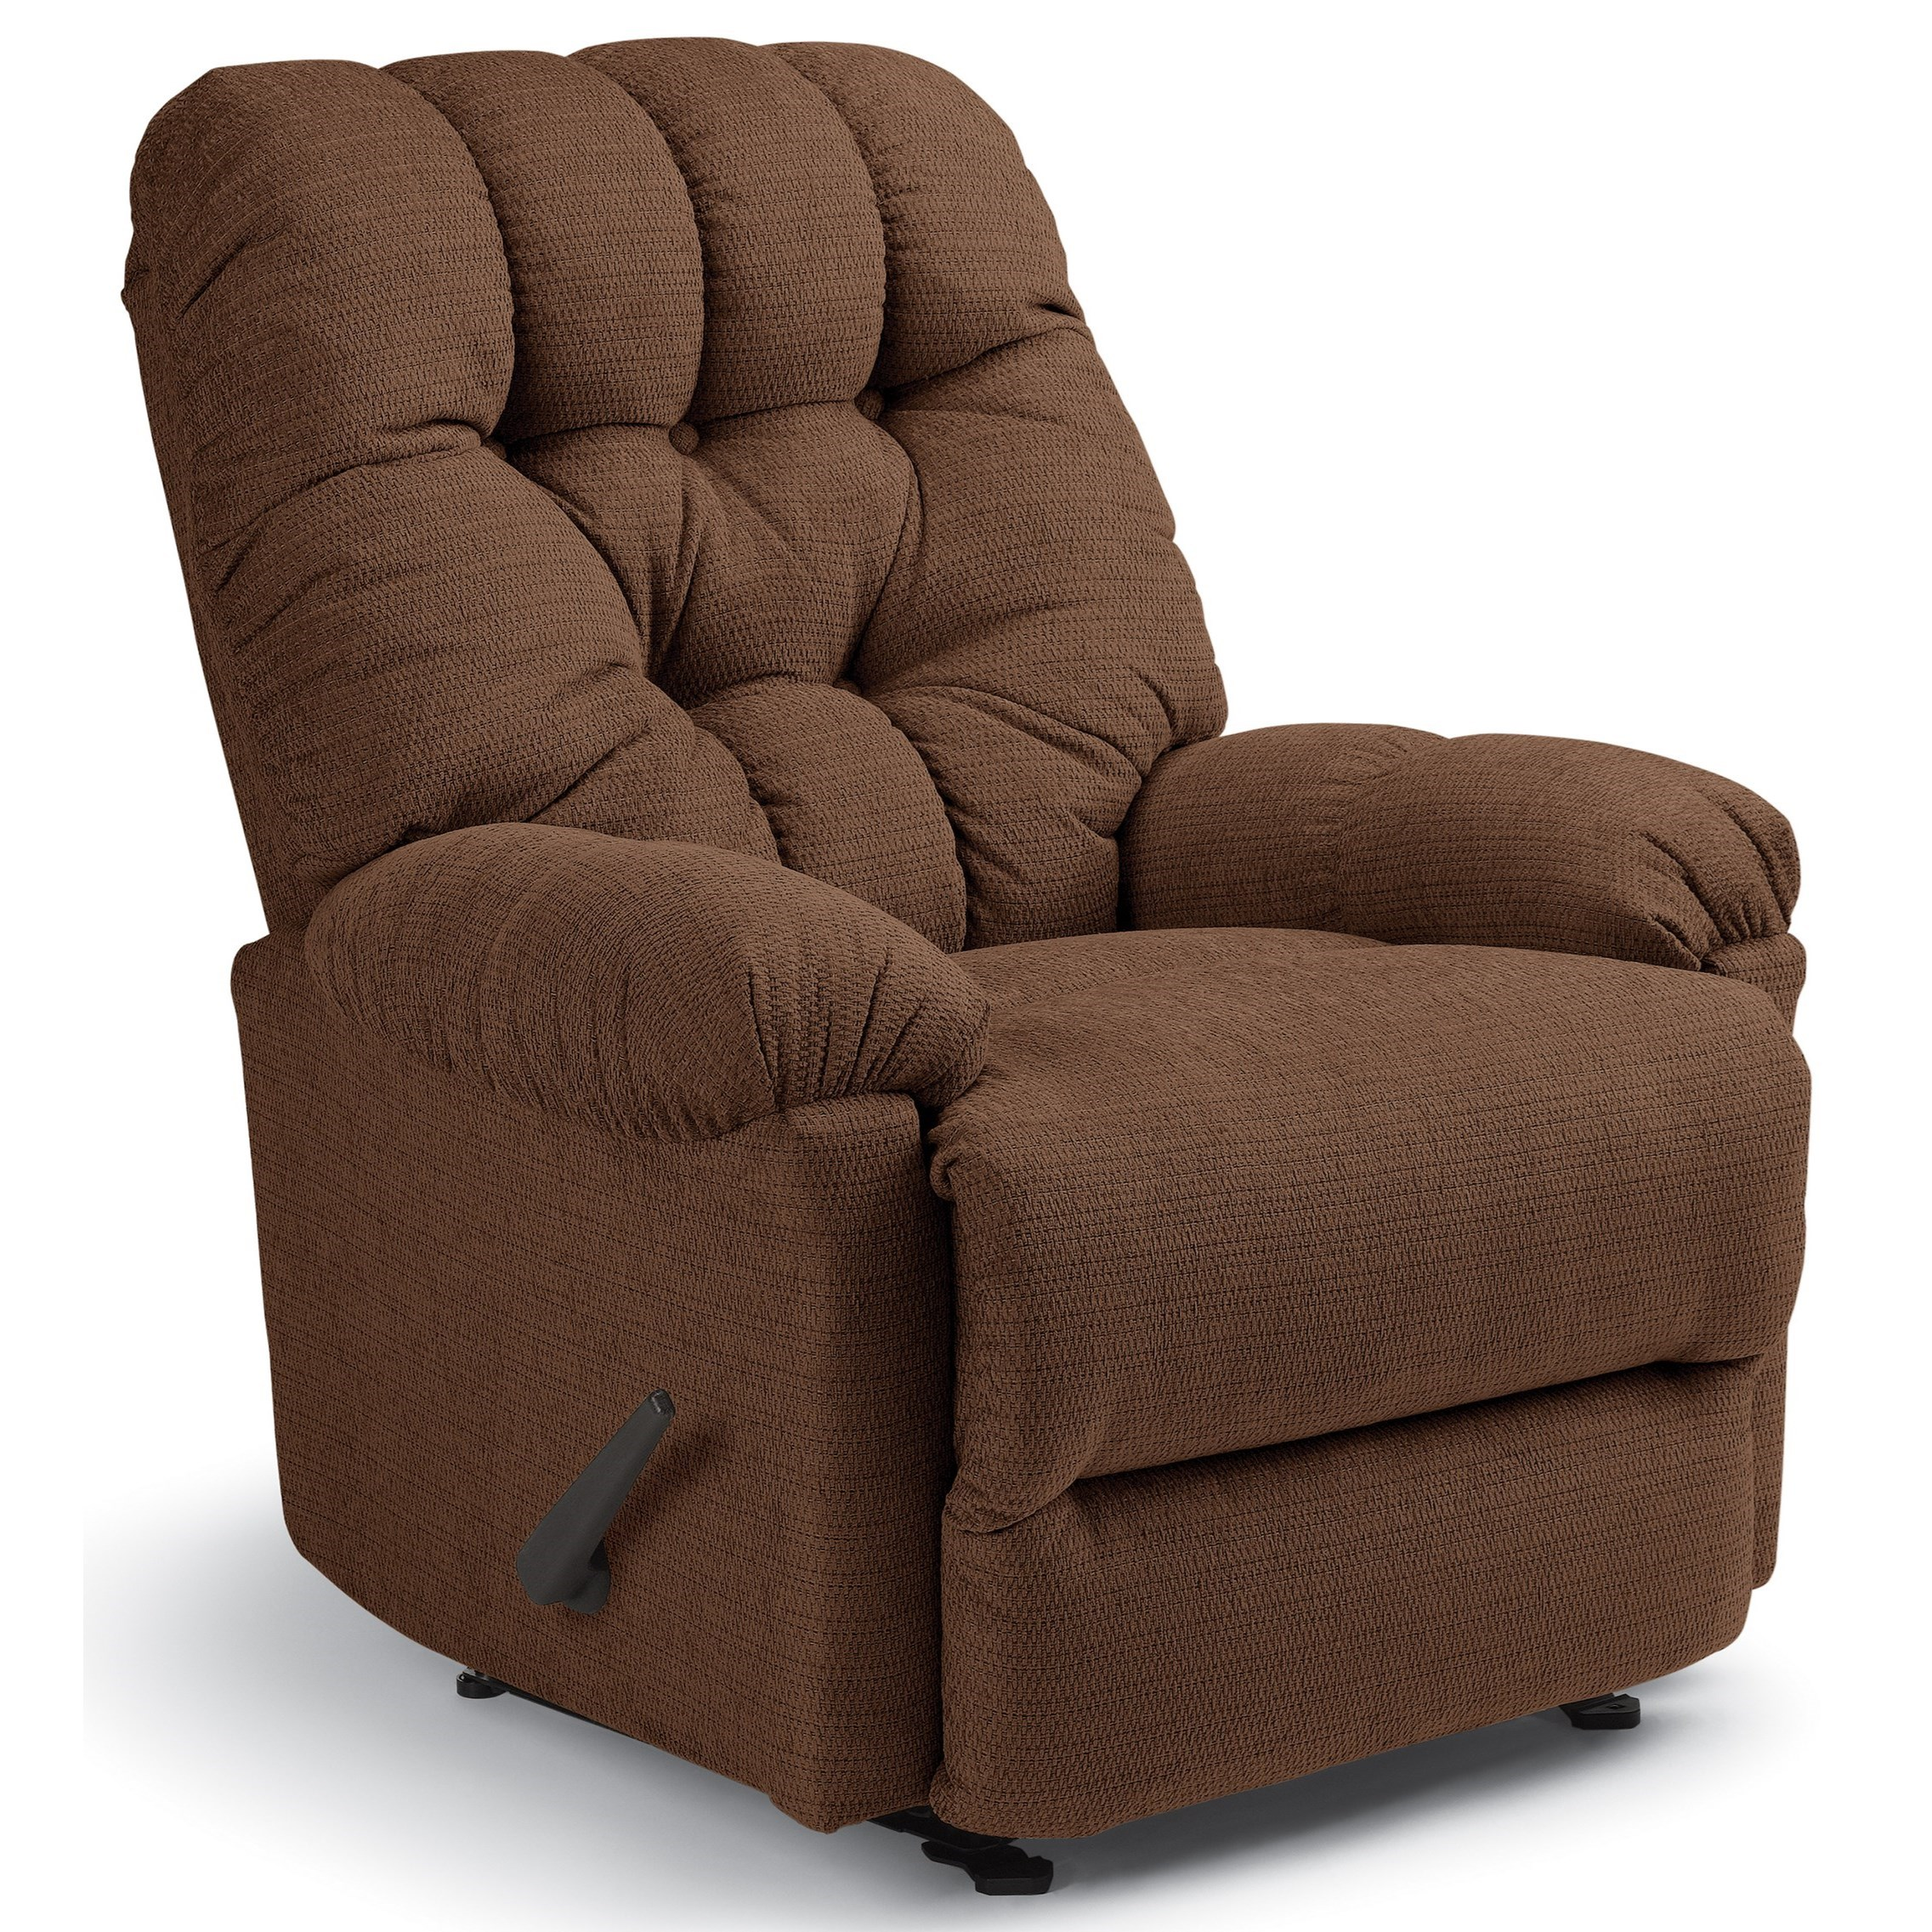 Raider Raider Rocker Recliner by Best Home Furnishings at Baer's Furniture